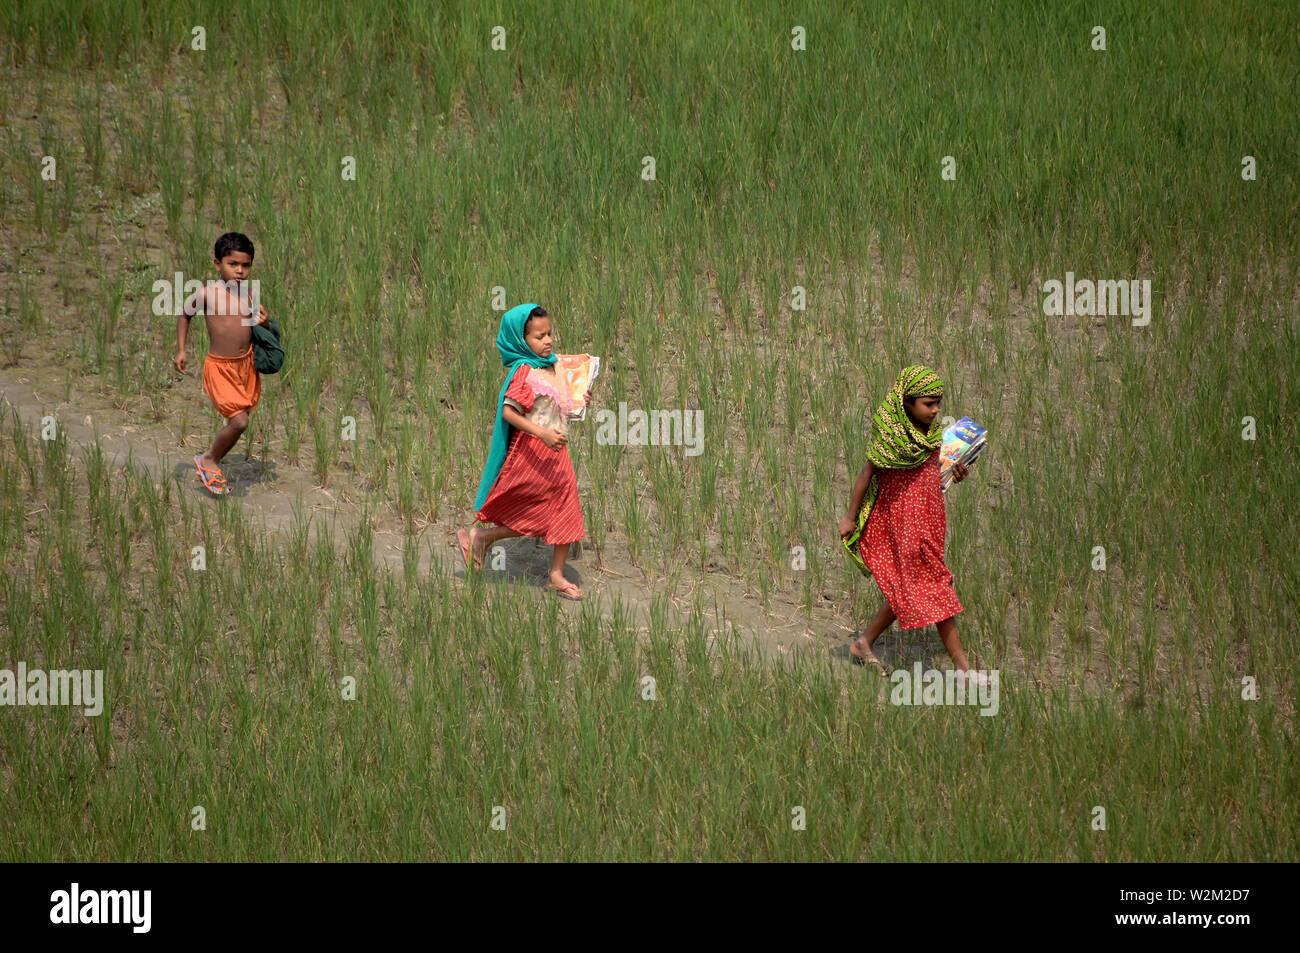 Children returning from school. Kalihati, Tangail, Bangladesh. March 4, 2008. - Stock Image